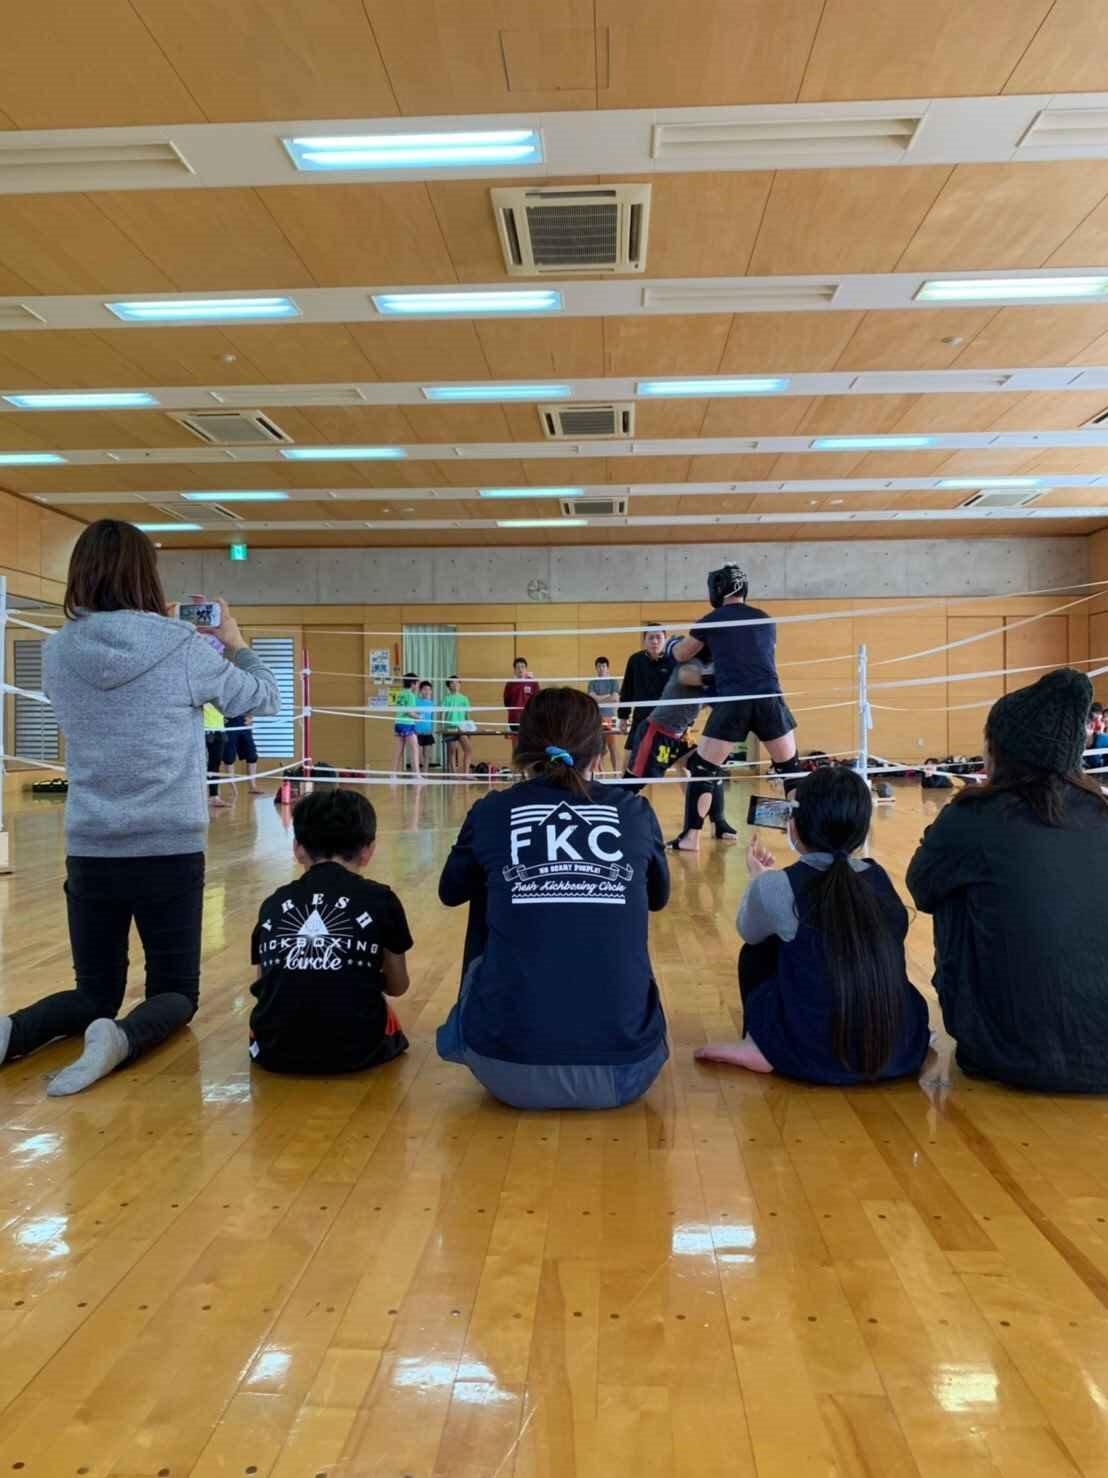 FKC (Fresh Kickboxing Circle) 日高市周辺